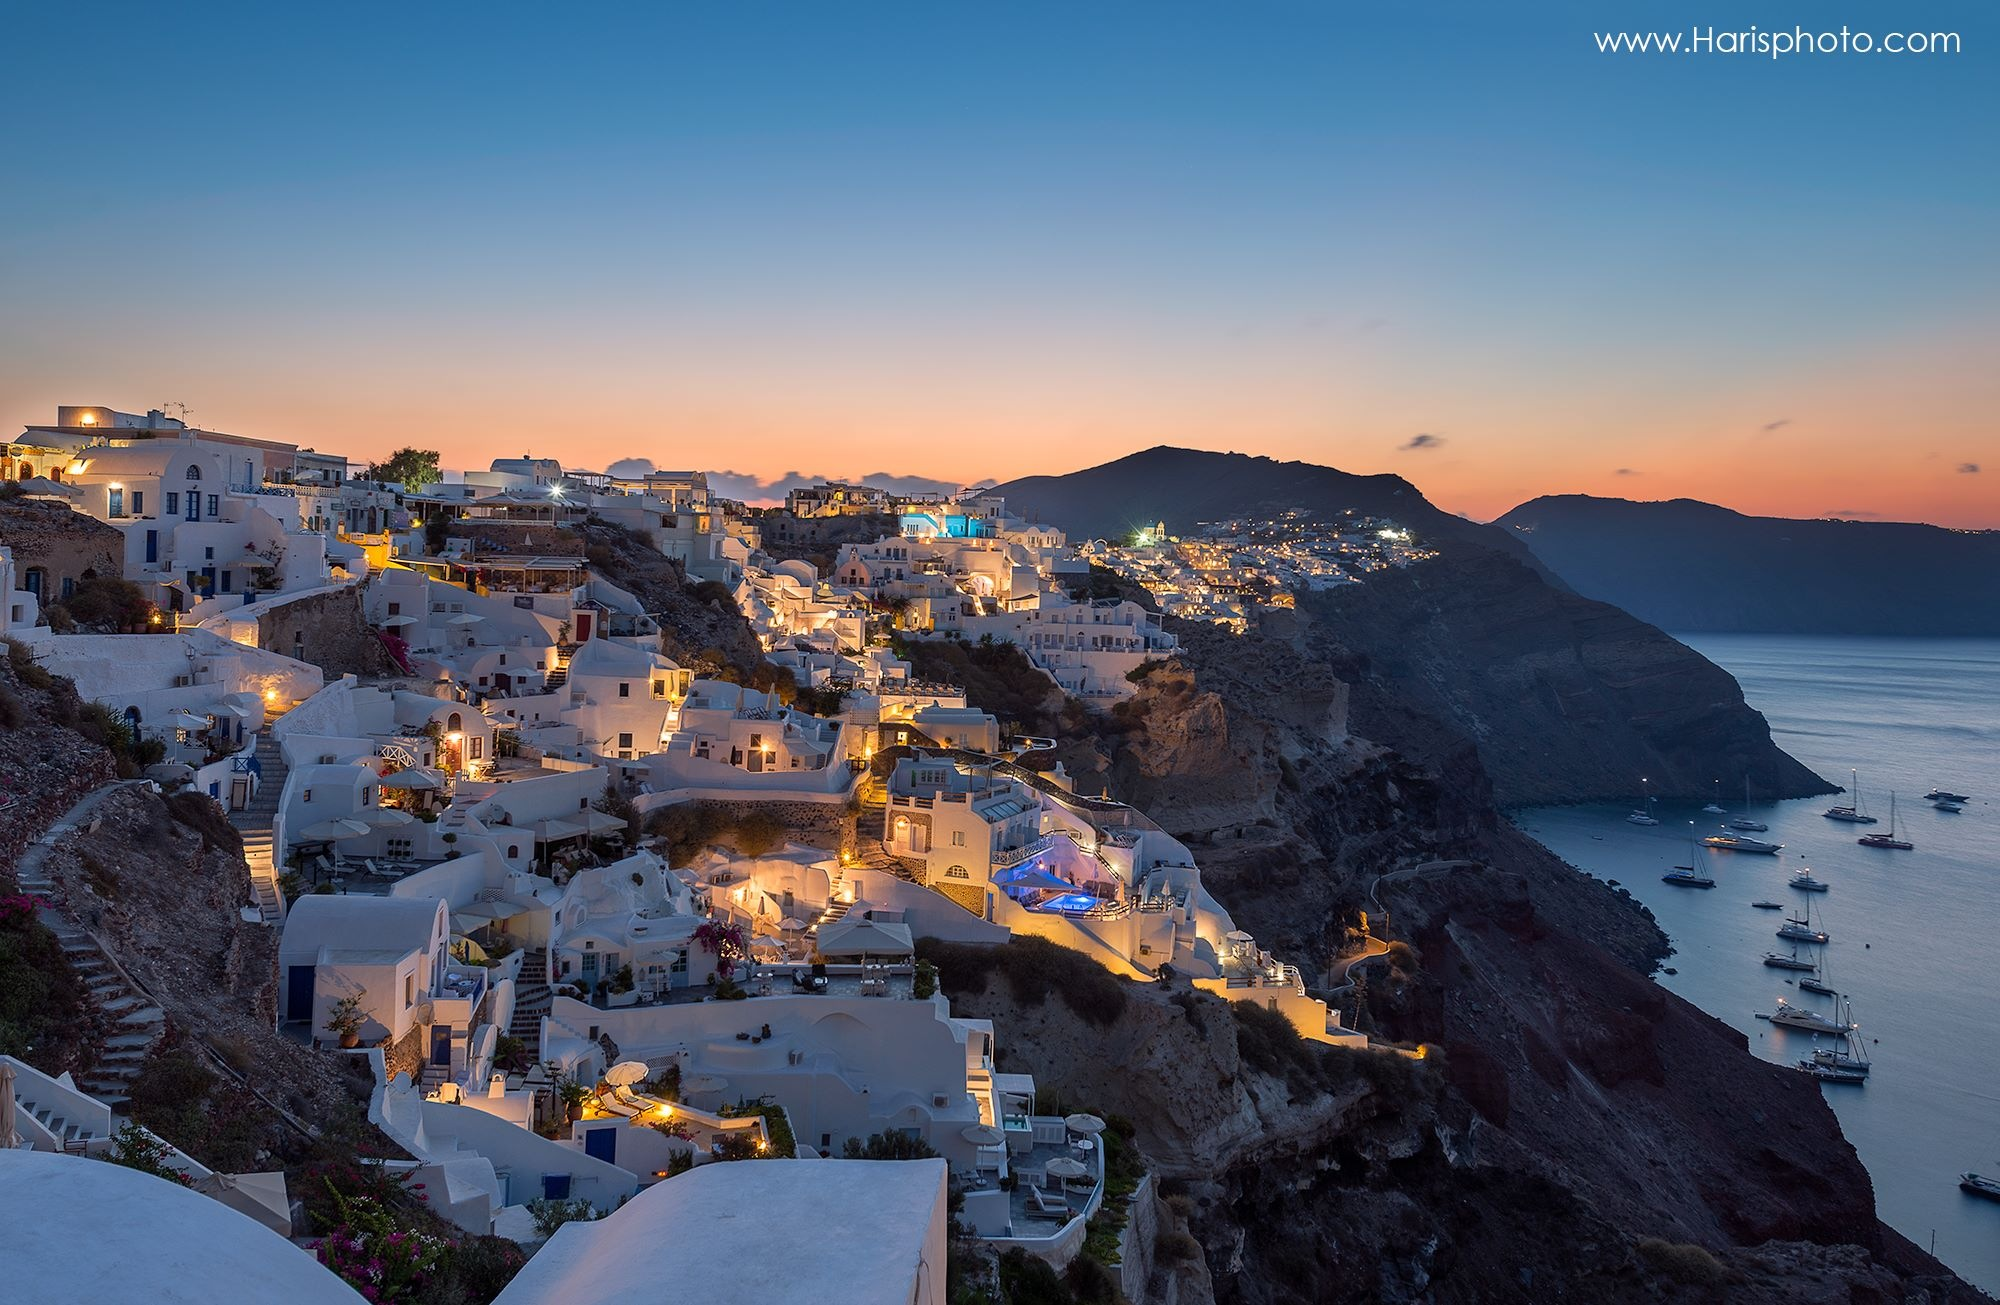 Oia Santorini by Haris Vithoulkas